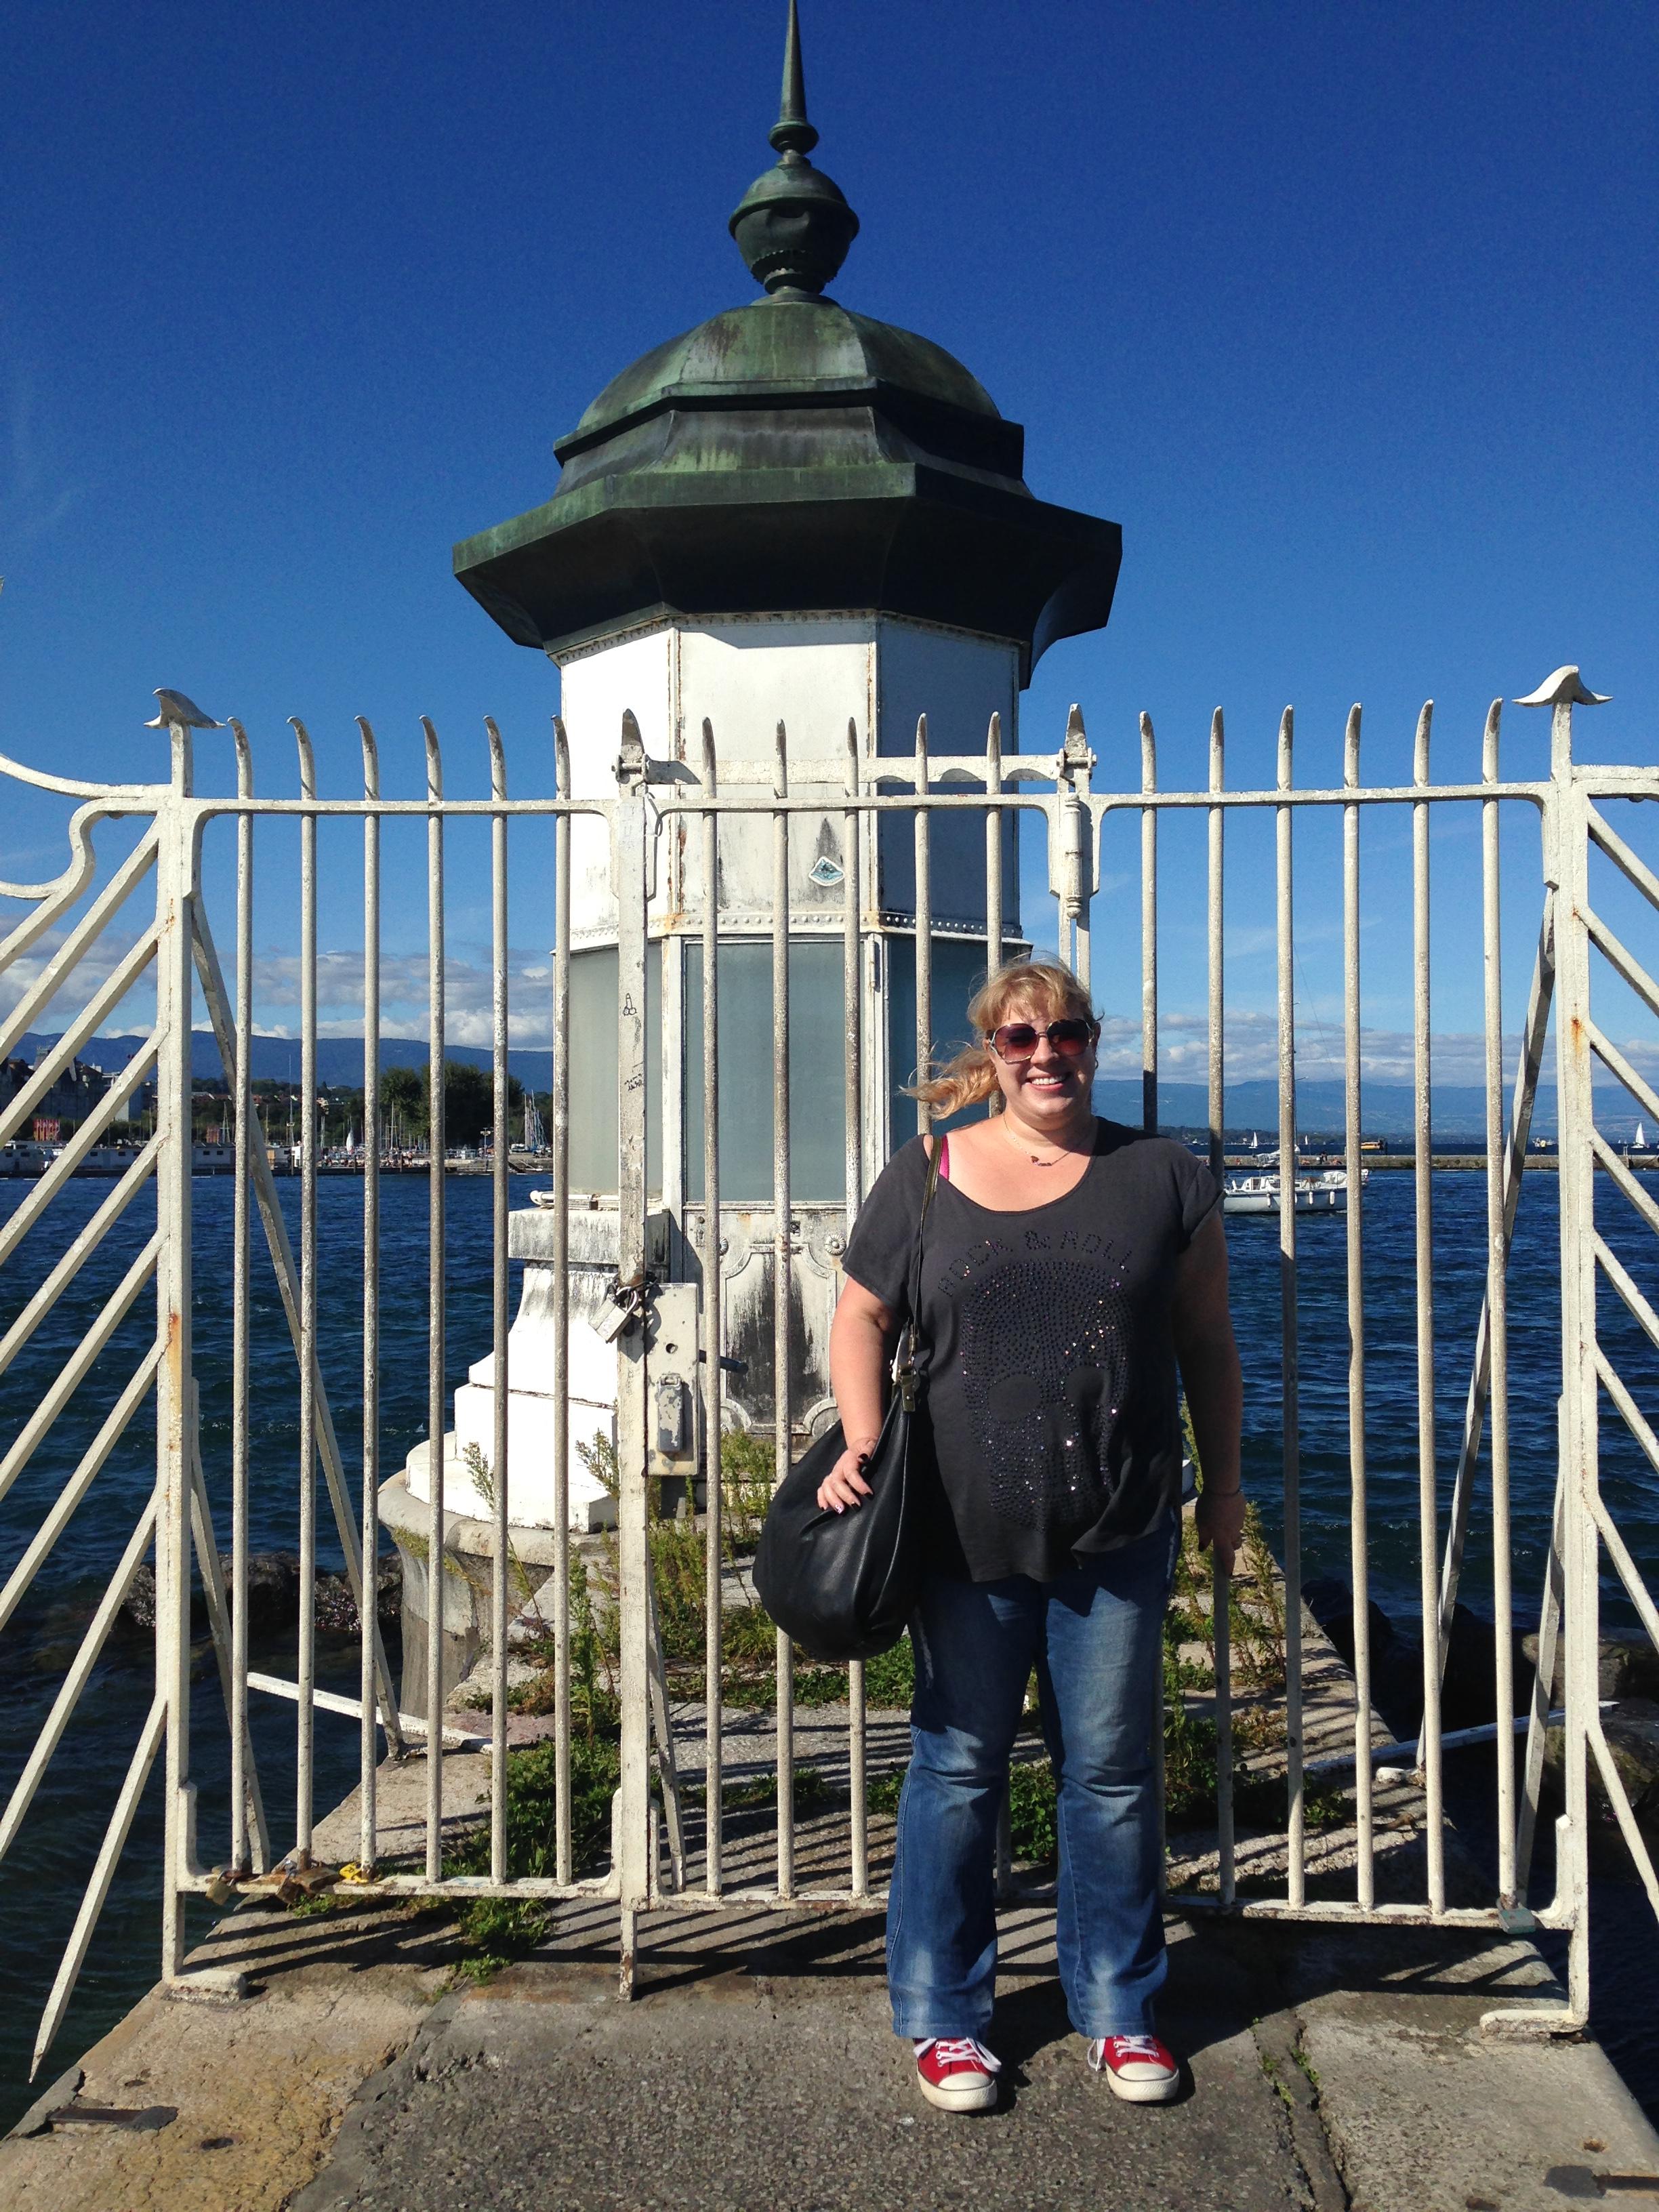 Nic at lighthouse